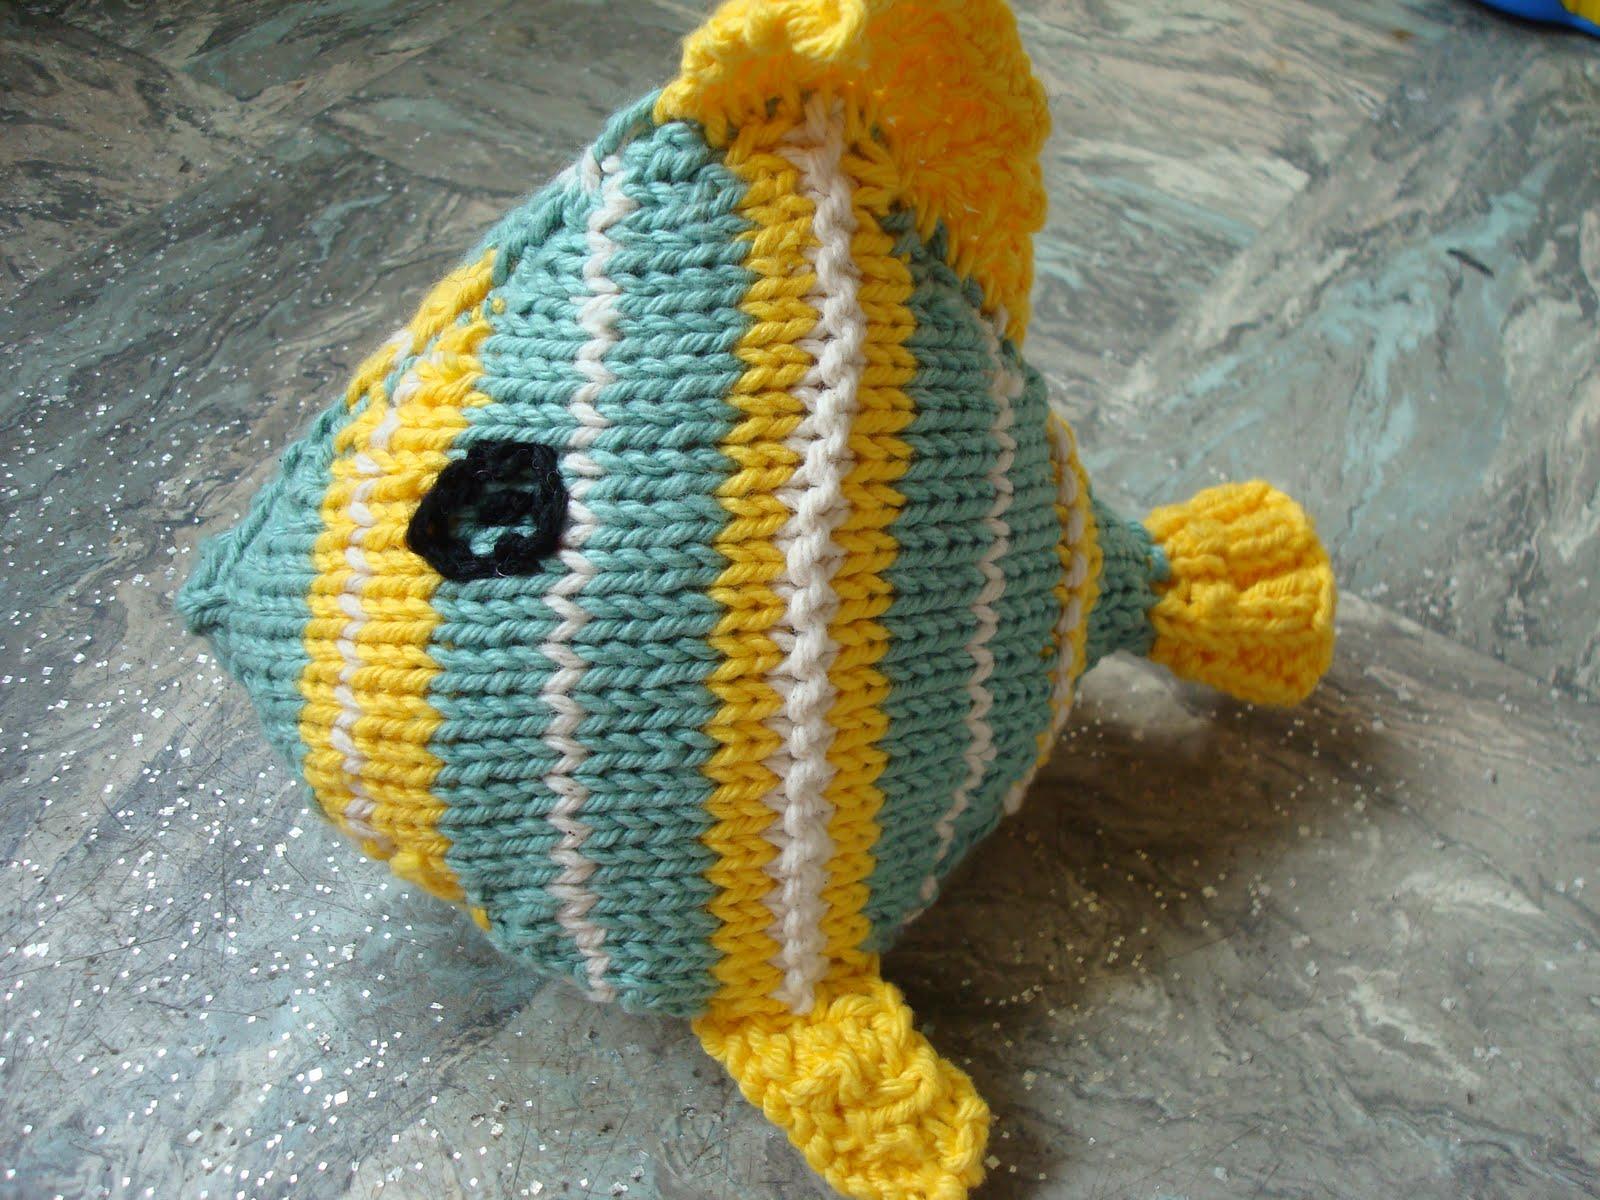 Knitted Amigurumi Sea Creatures : Spiritual knitter: Under the sea